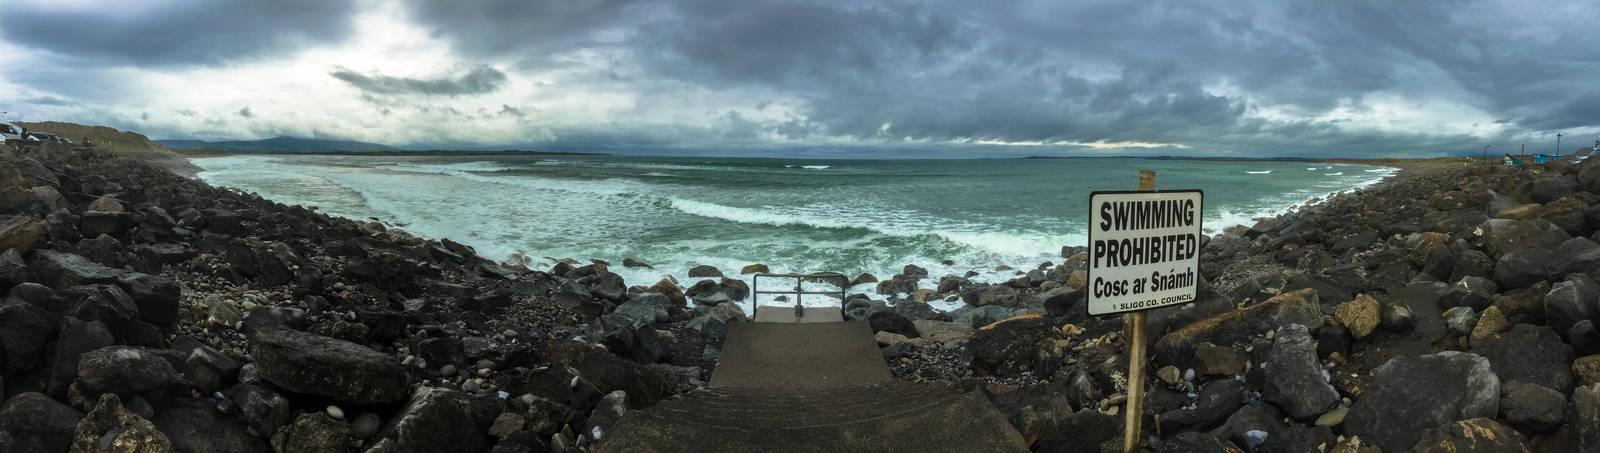 Stormy Strandhill